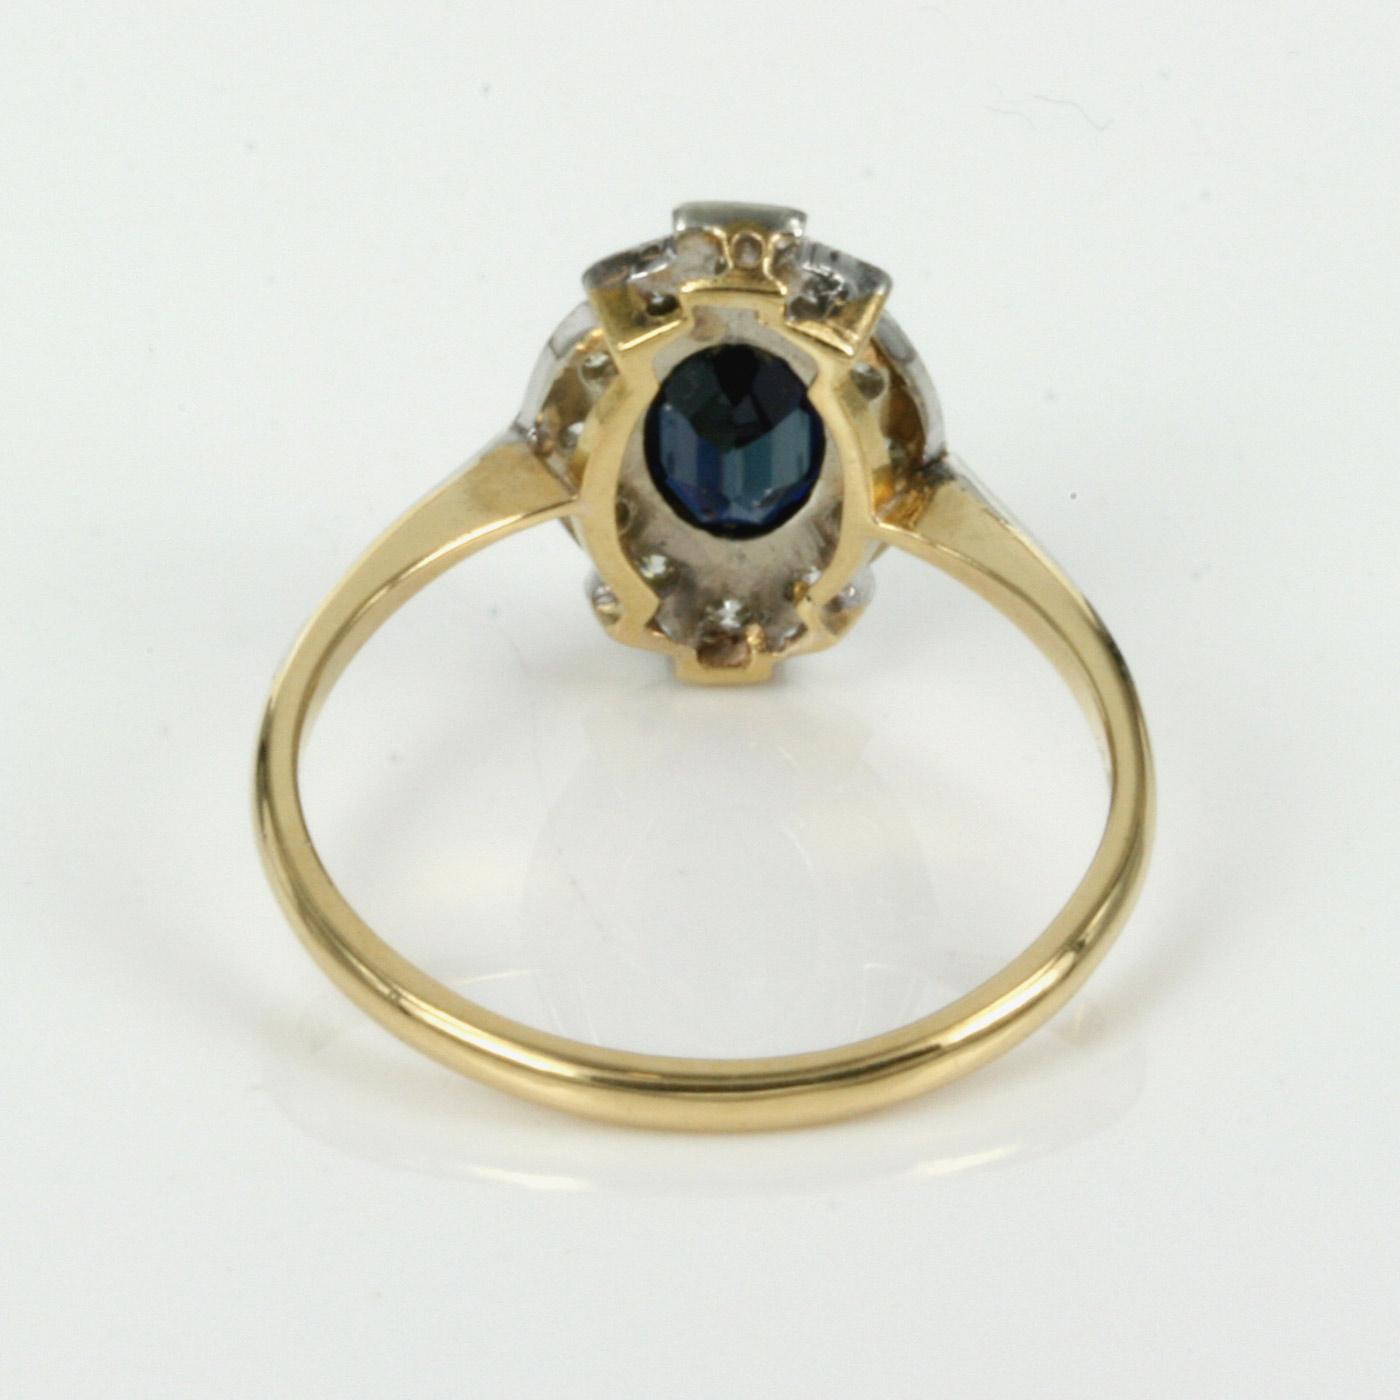 Buy Art Deco gold & platinum sapphire & diamond ring Sold Items